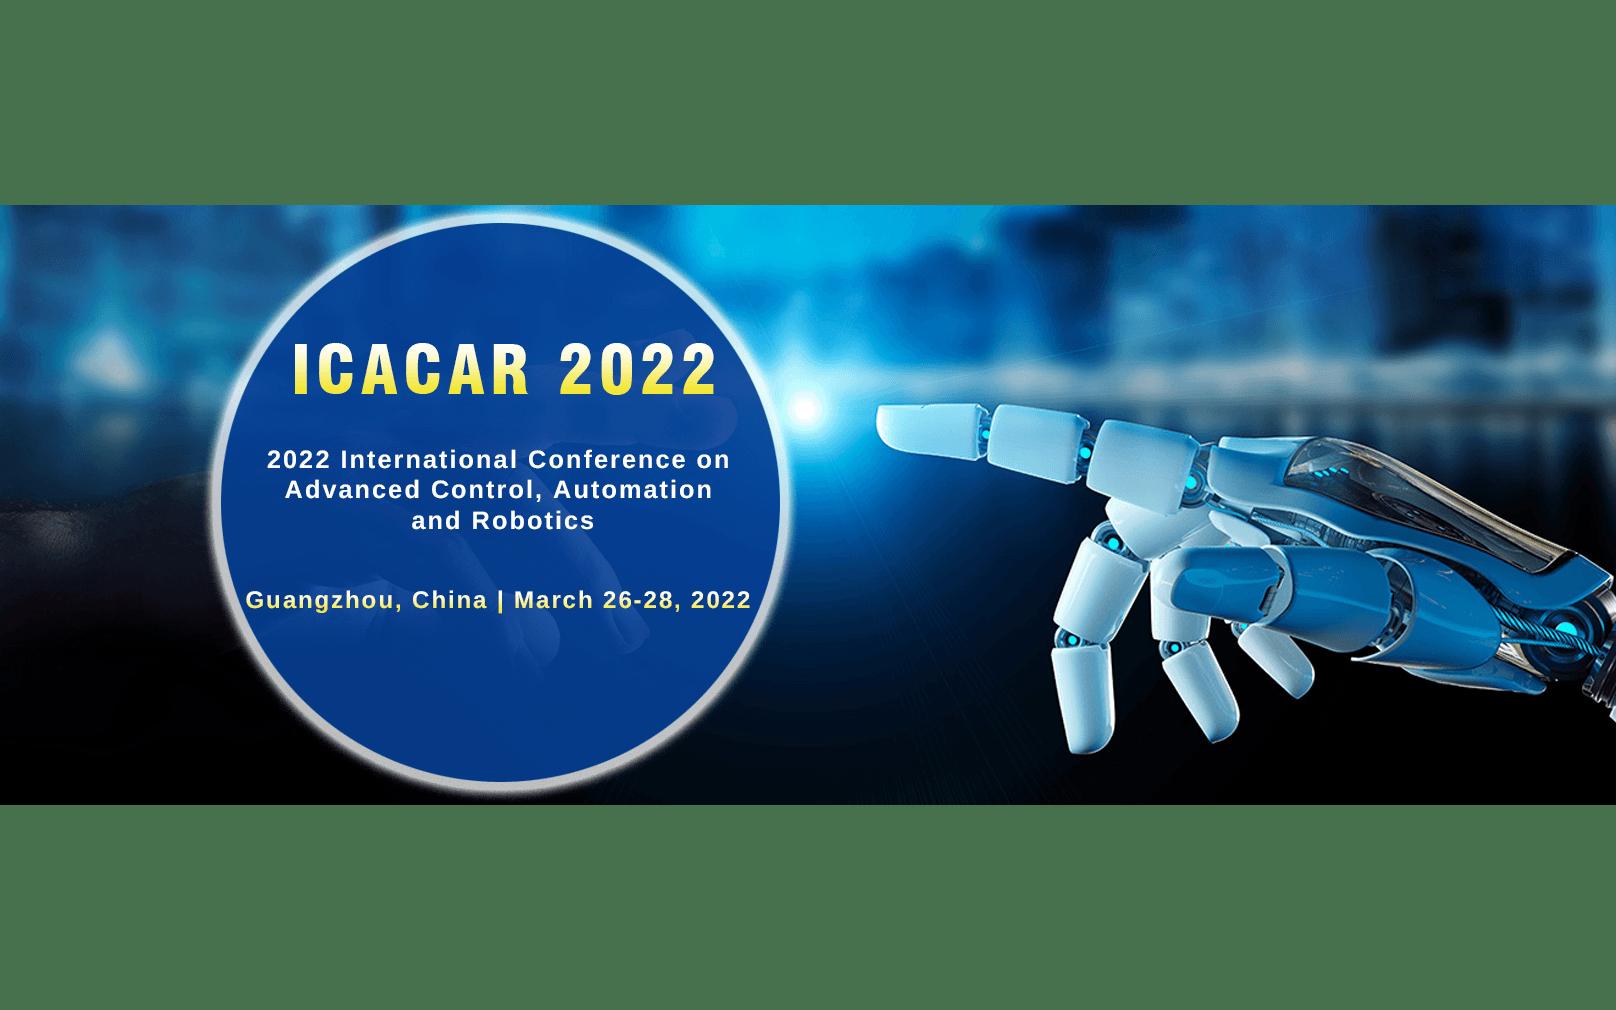 【EI检索】2022年第五届先进控制,自动化与机器人国际会议(ICACAR 2022)